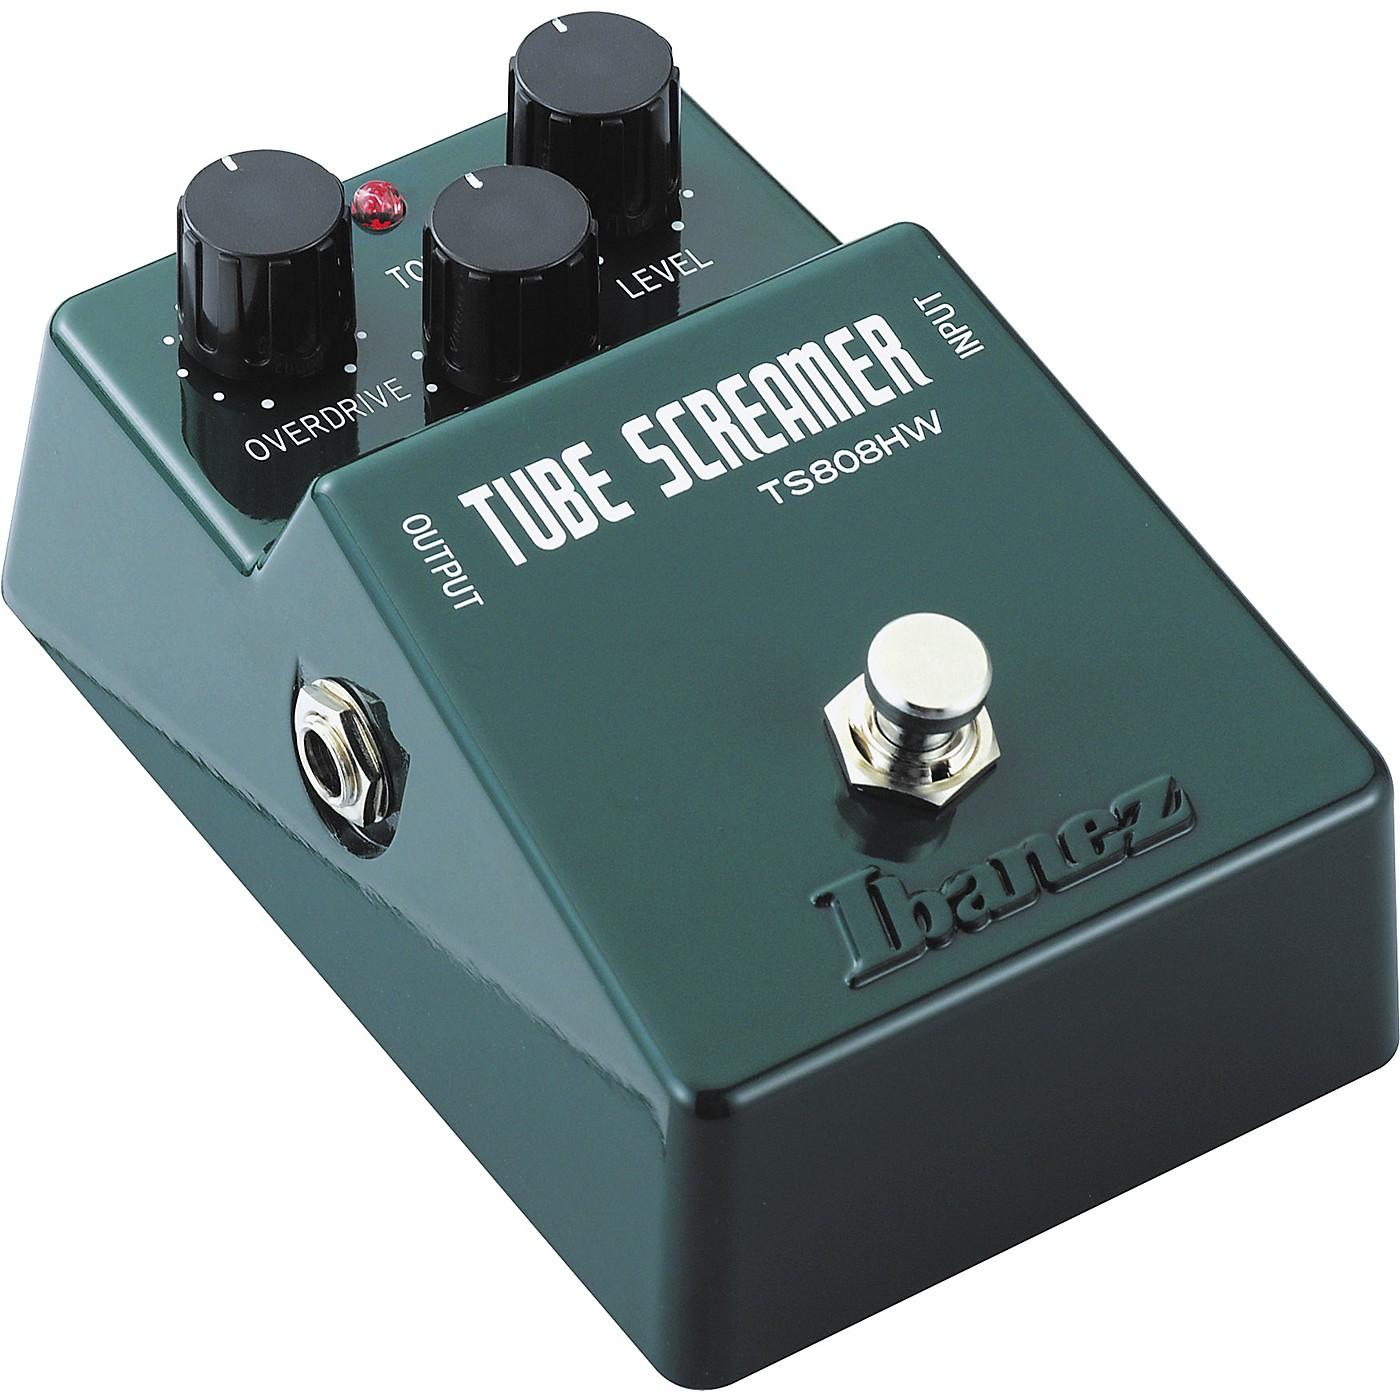 Ibanez TS808HW Tube Screamer Overdrive Guitar Effects Pedal thumbnail